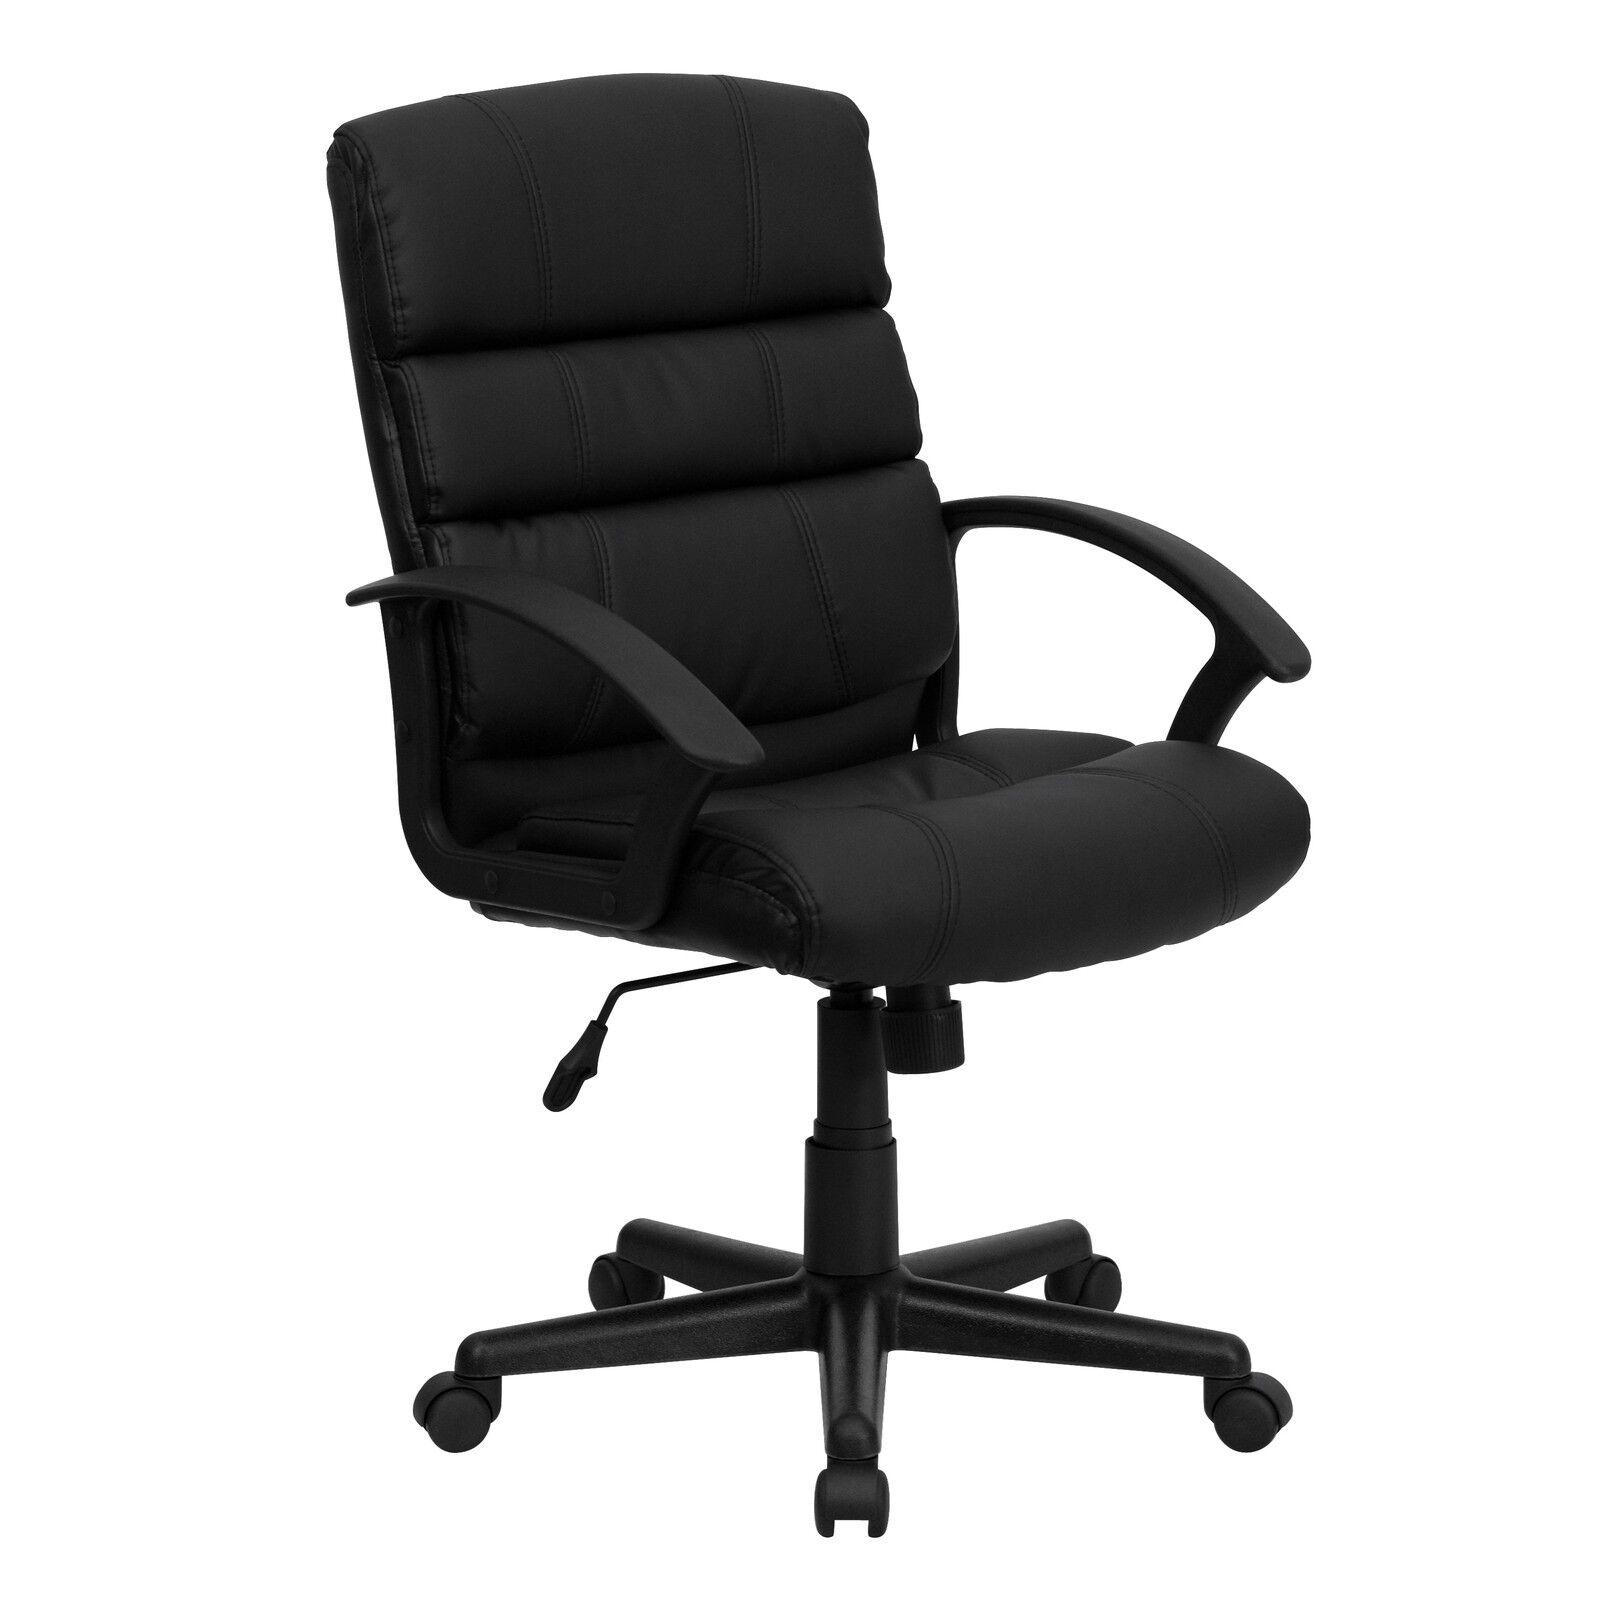 fice Furniture fice Business & Industrial